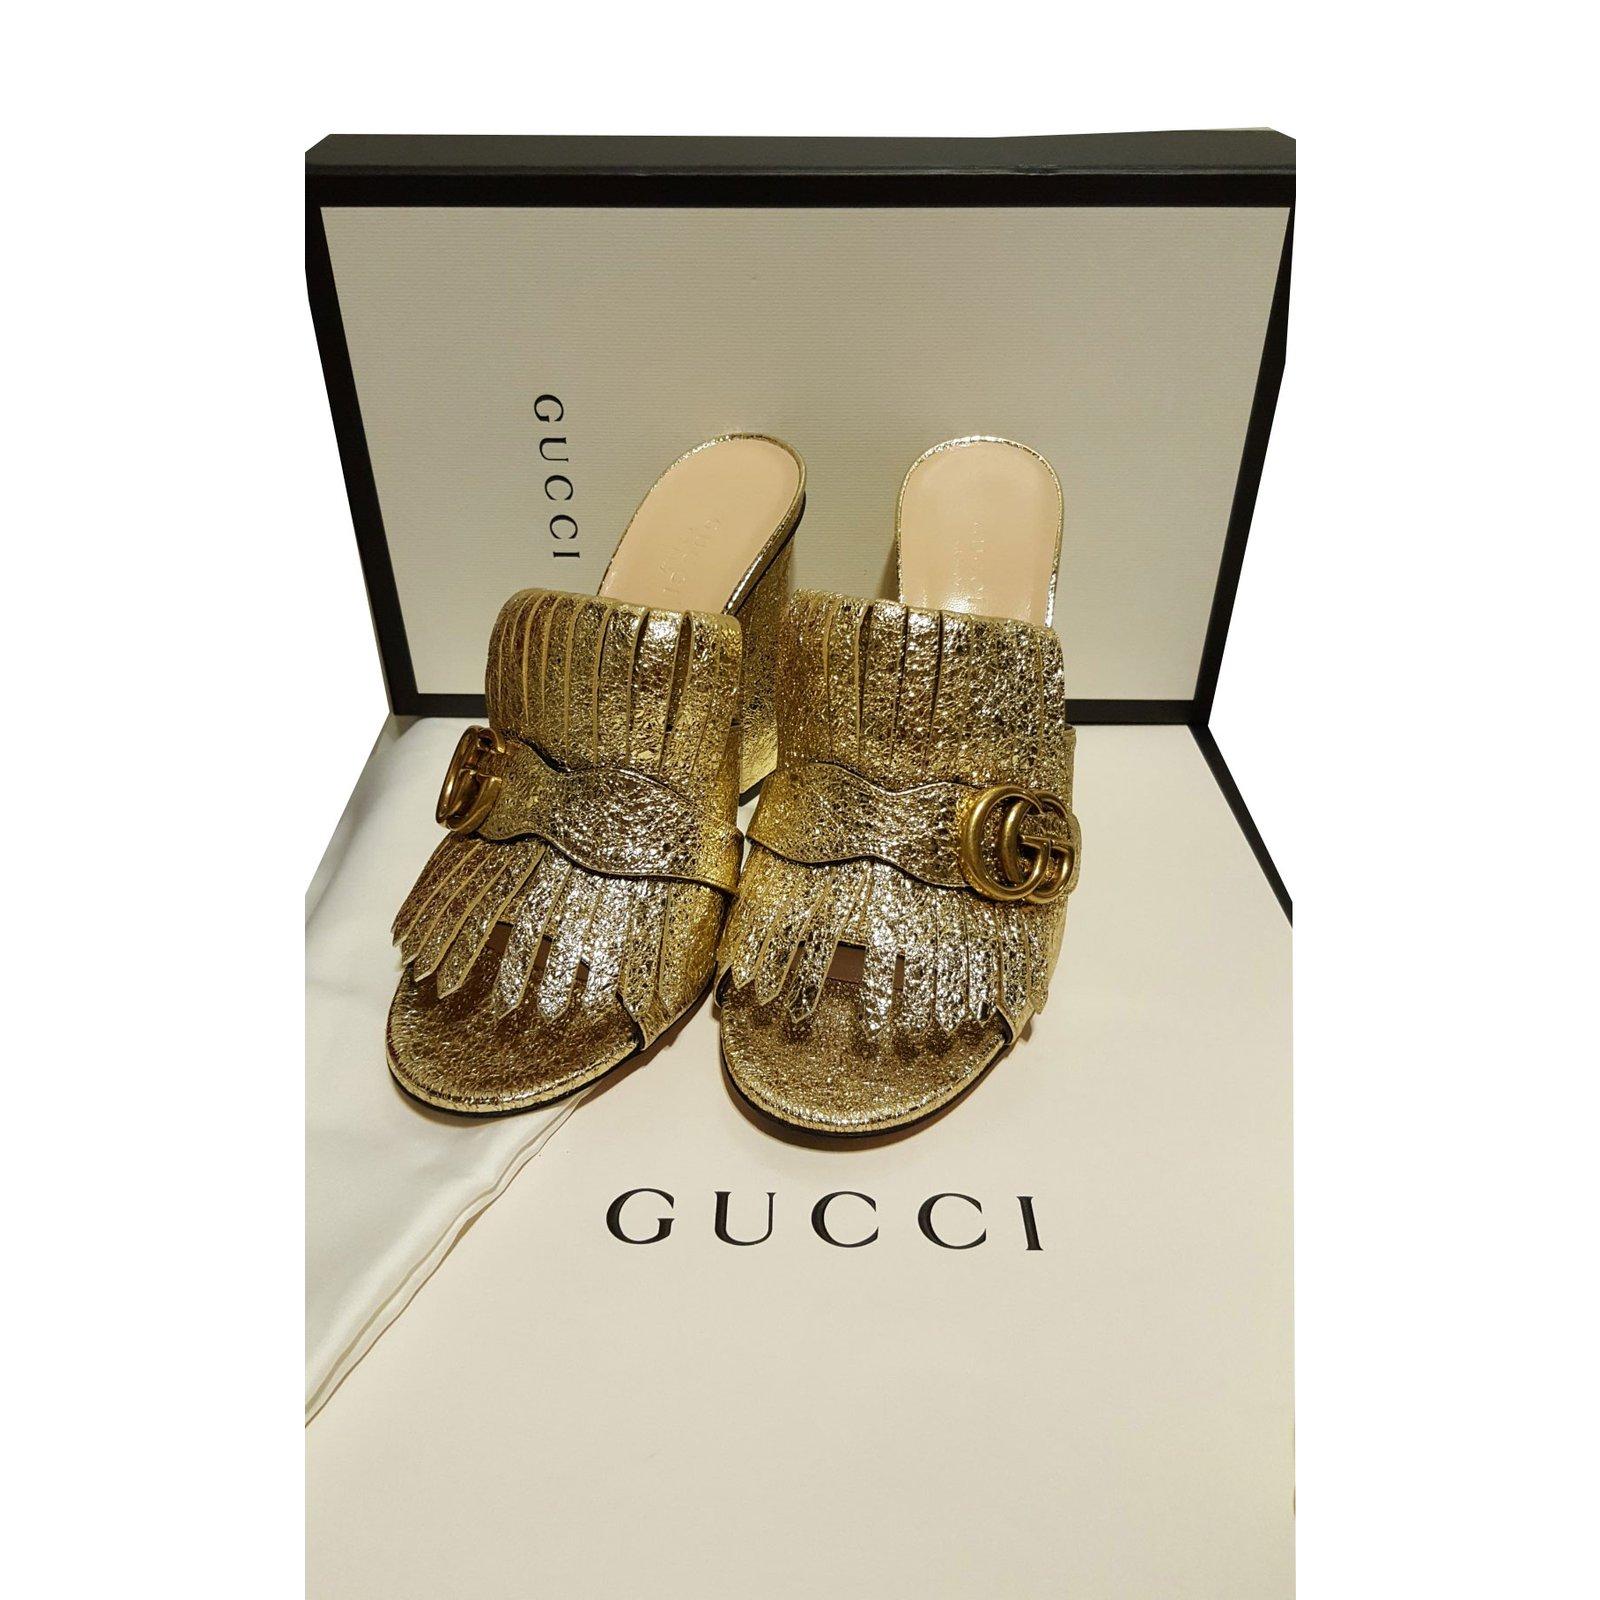 207fec6e7 Gucci Gucci marmont Sandals Leather Golden ref.56270 - Joli Closet